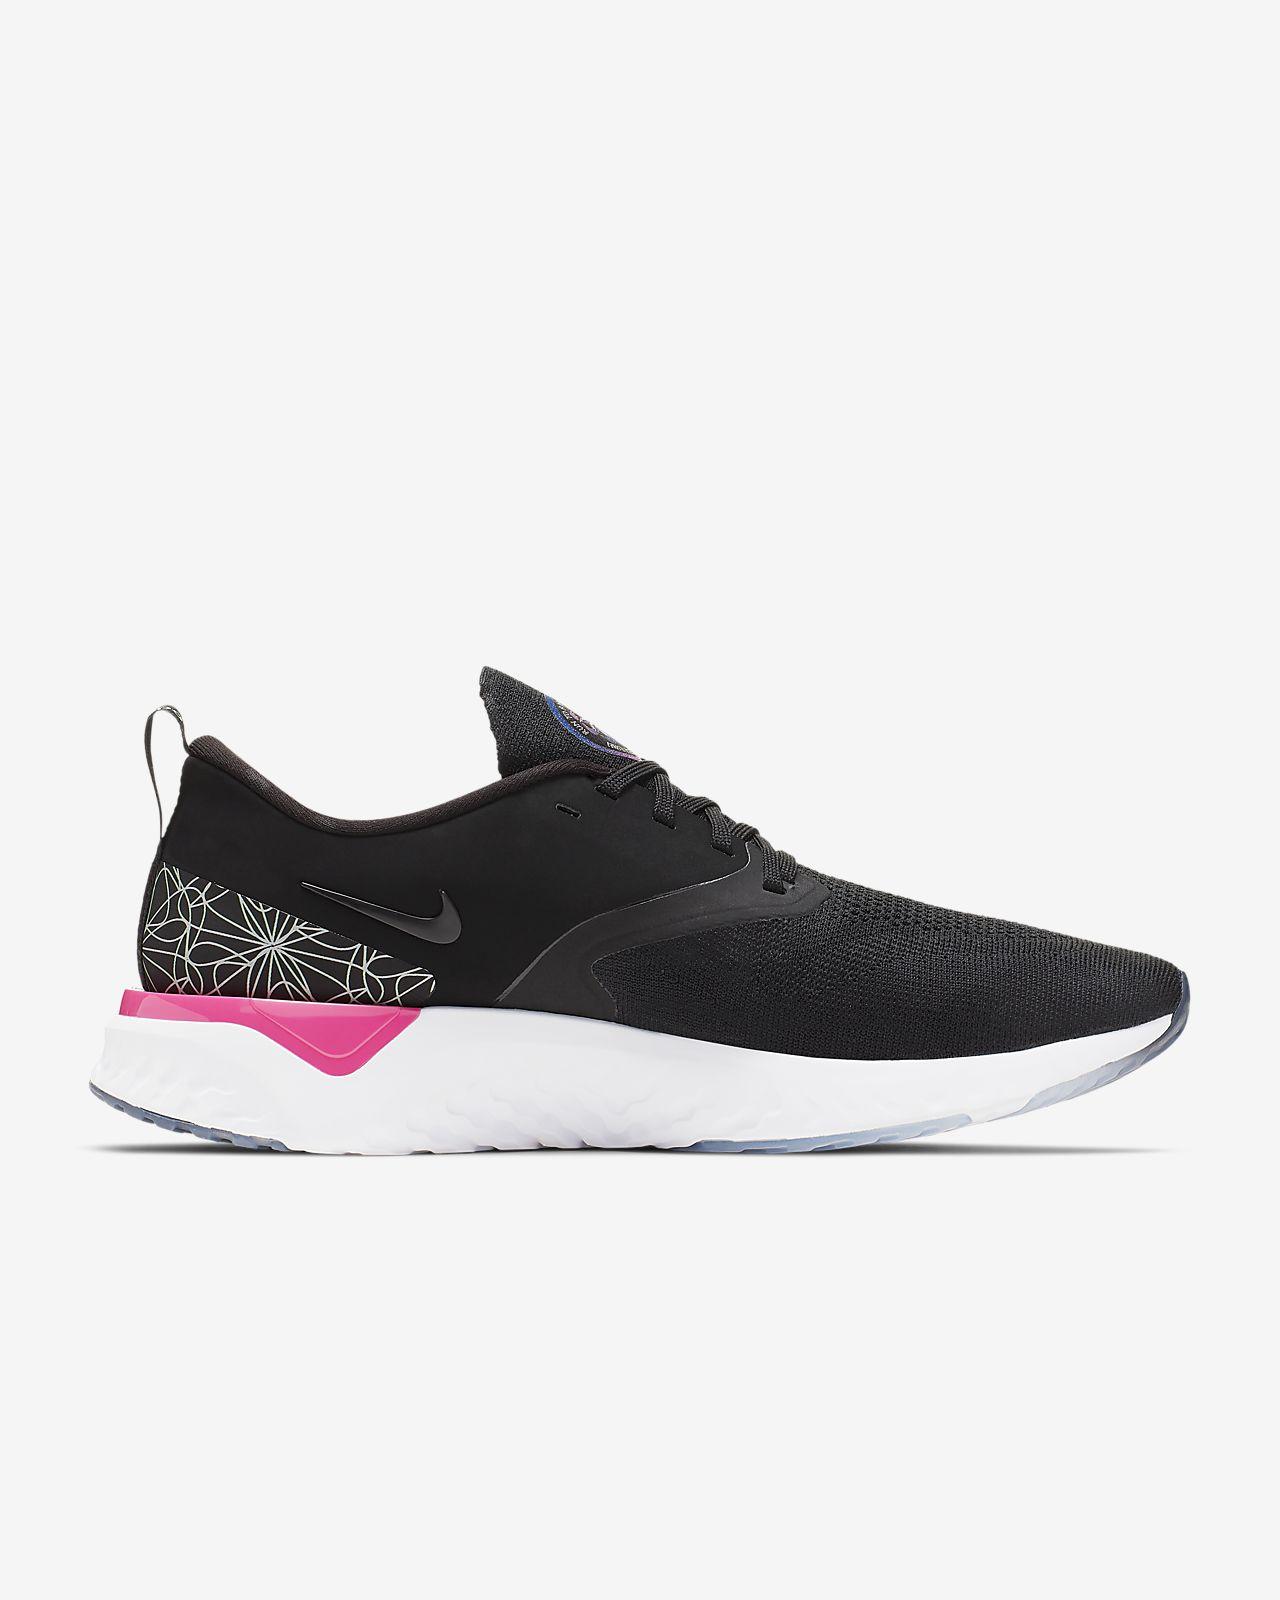 Nike Odyssey React Flyknit 2 Men\u0027s Graphic Running Shoe